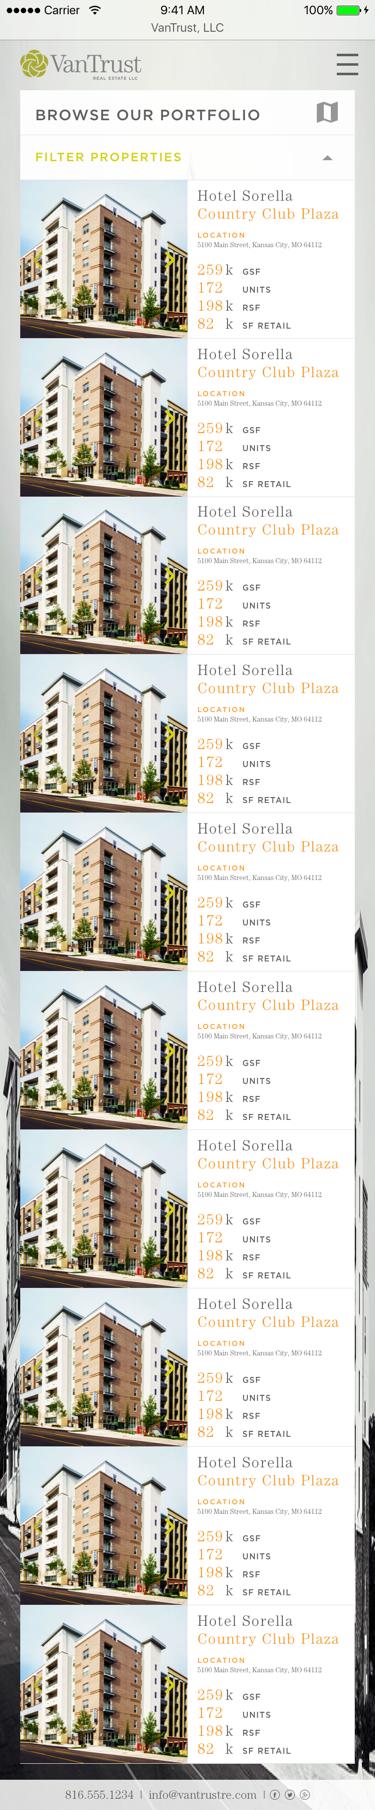 VanTrust Real Estate - Property Search, Grid View, Mobile